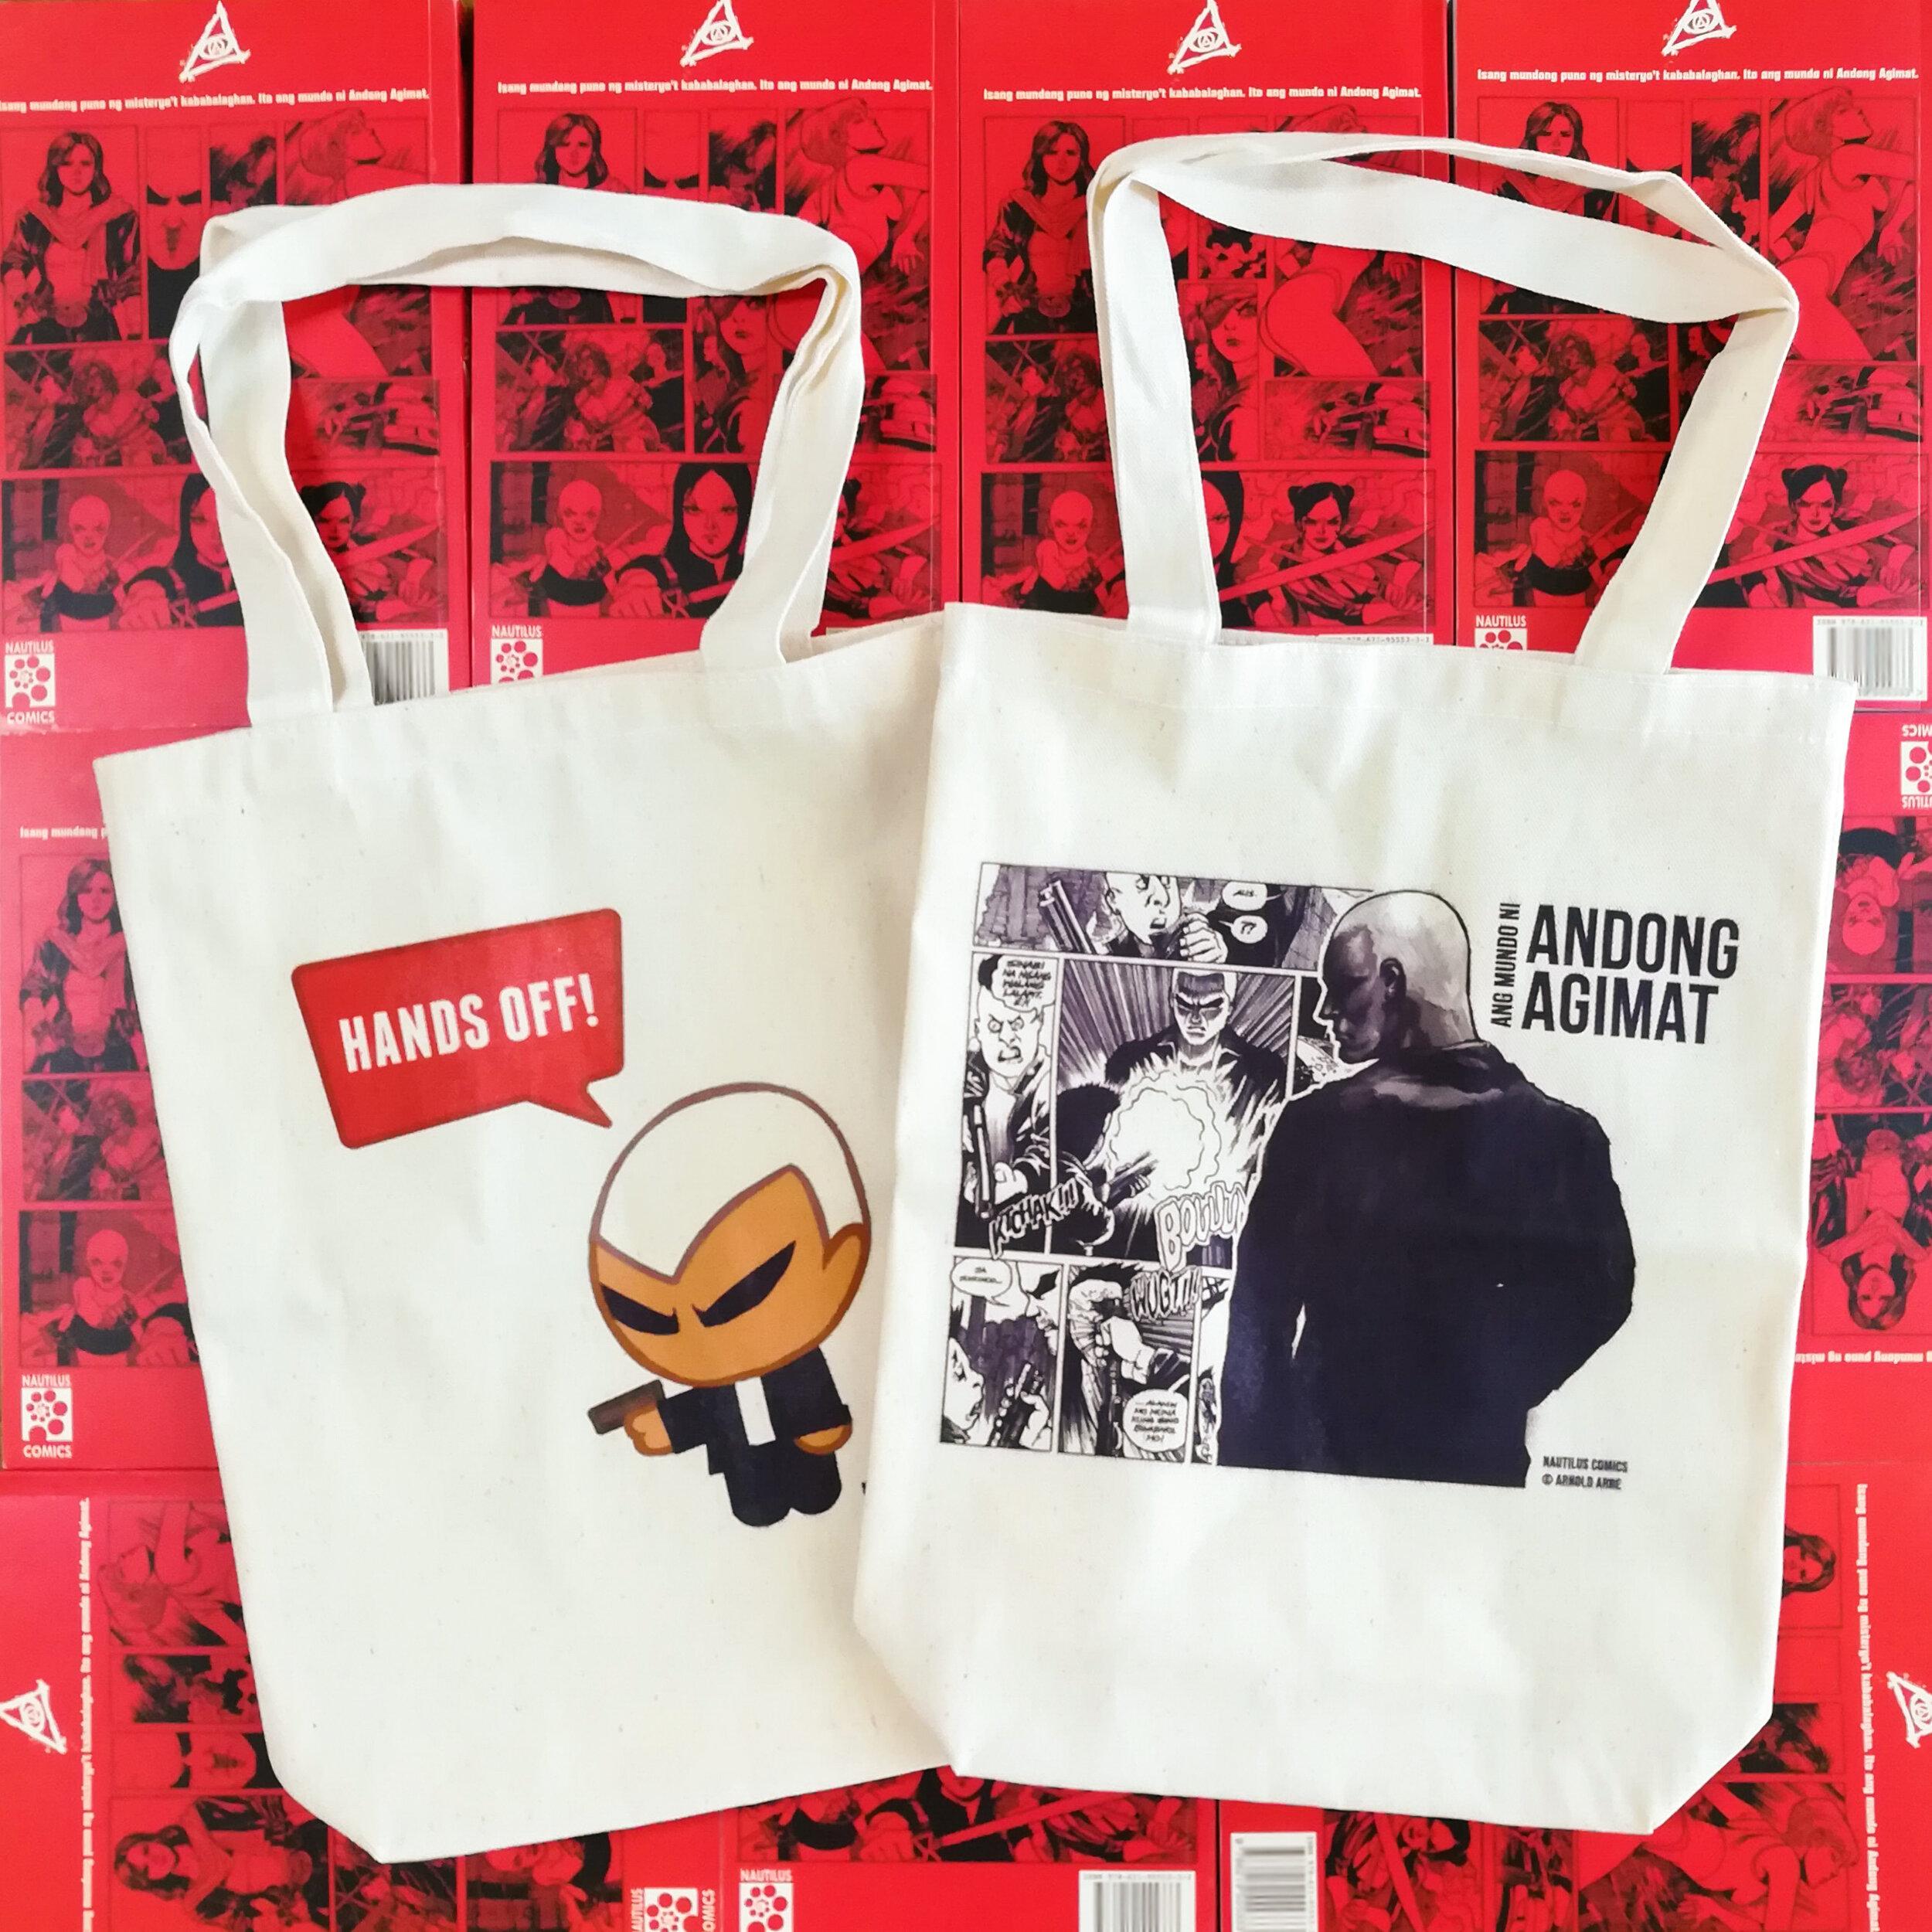 Andong Agimat canvas bag